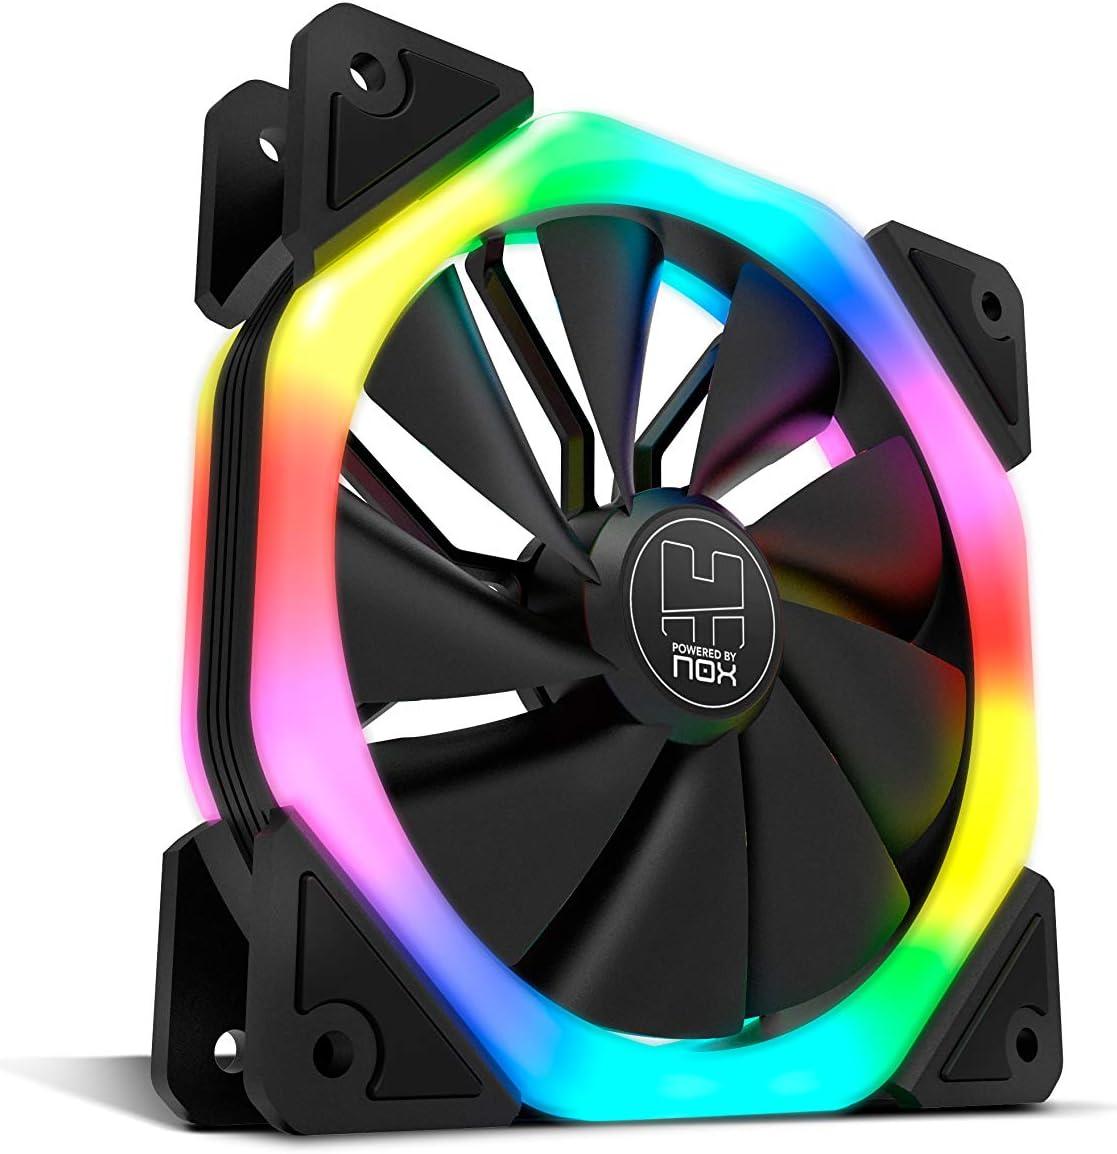 Nox DFAN - NXHUMMERDFAN - Ventilador para caja de ordenador, 120 mm, Doble anillo LED RGB rainbow